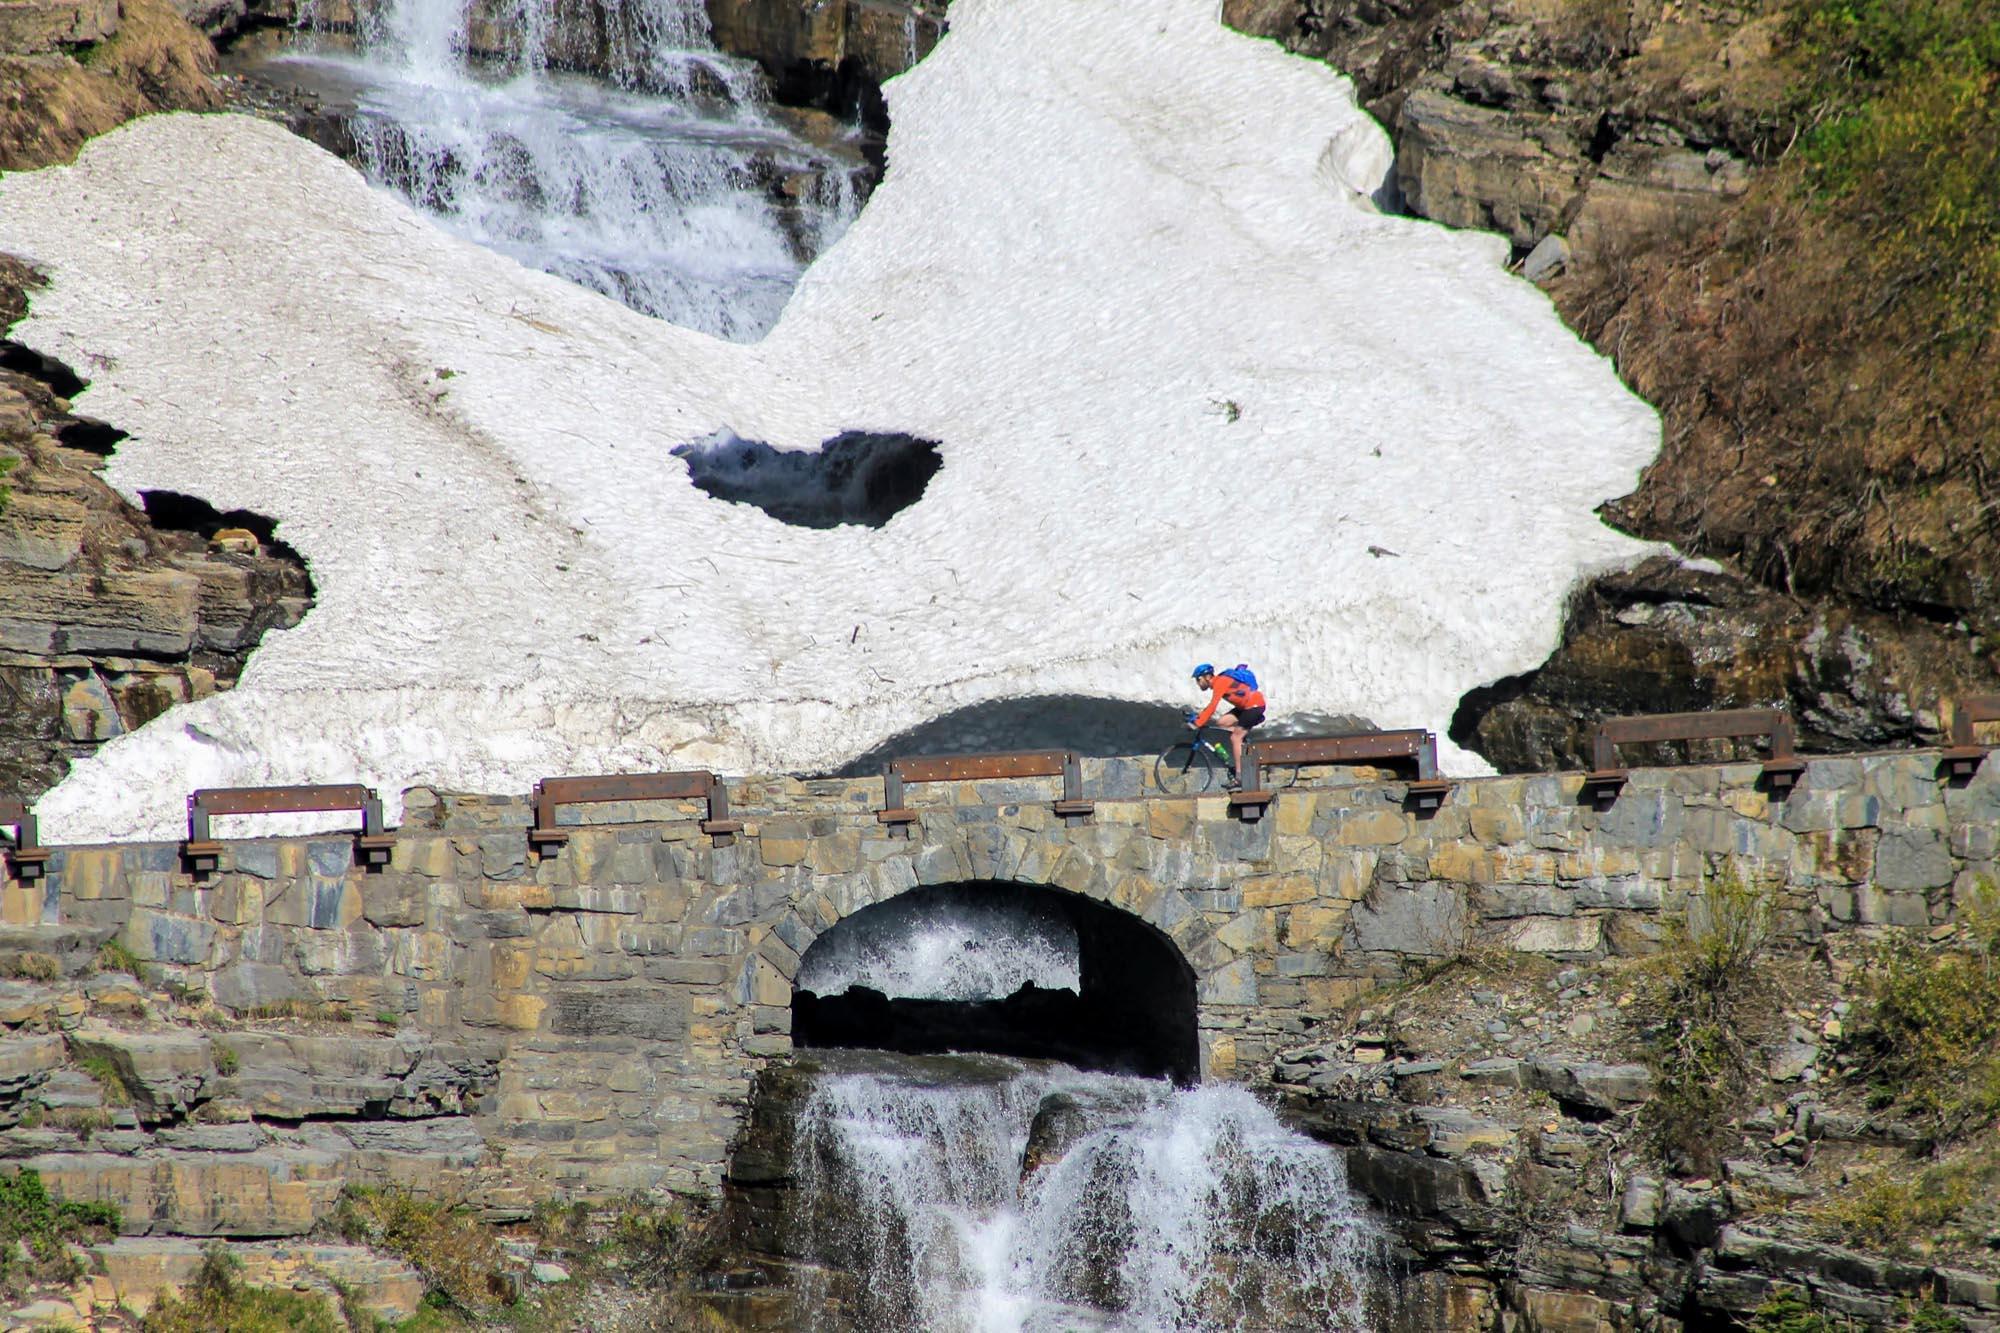 Waterfalls are plentiful along the journey to Logan Pass